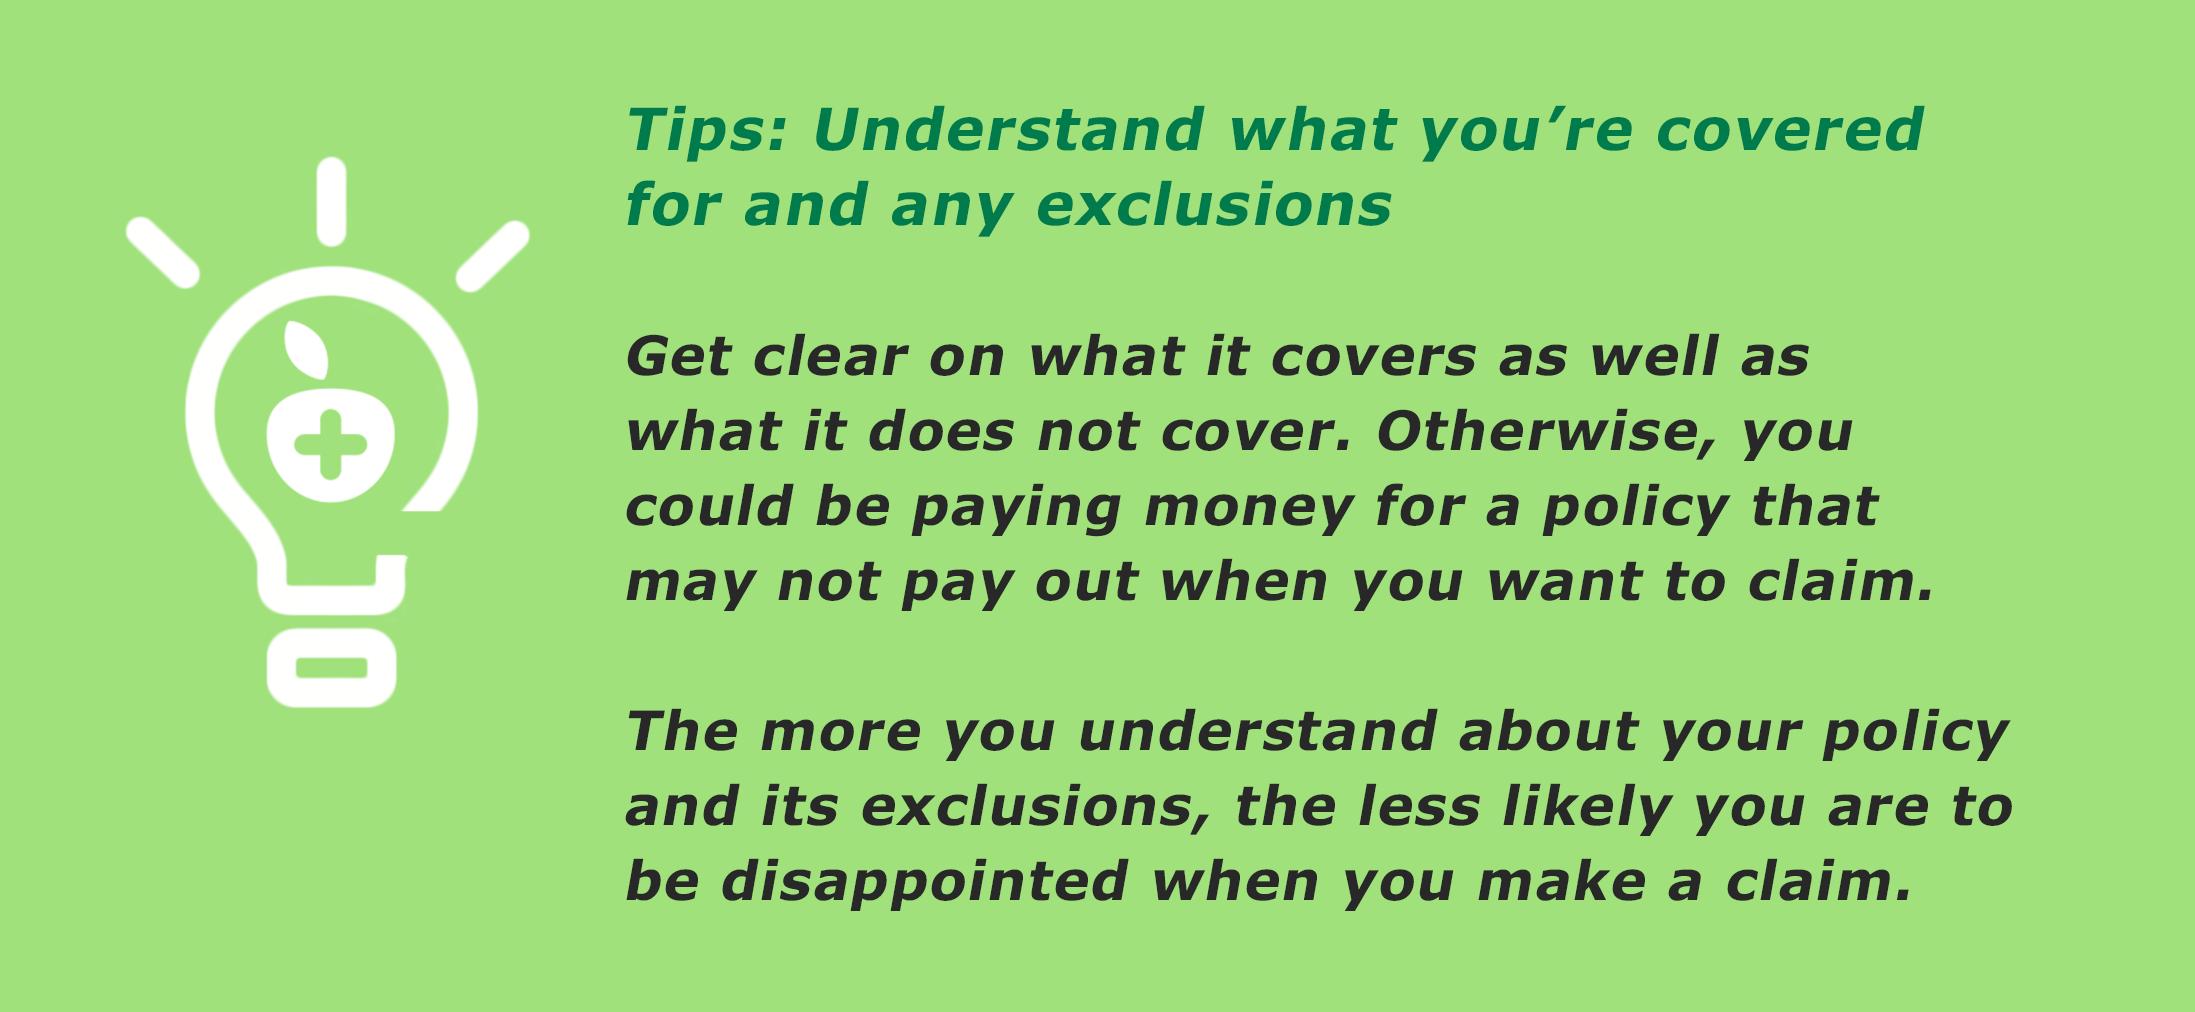 health insurance guide-tip3